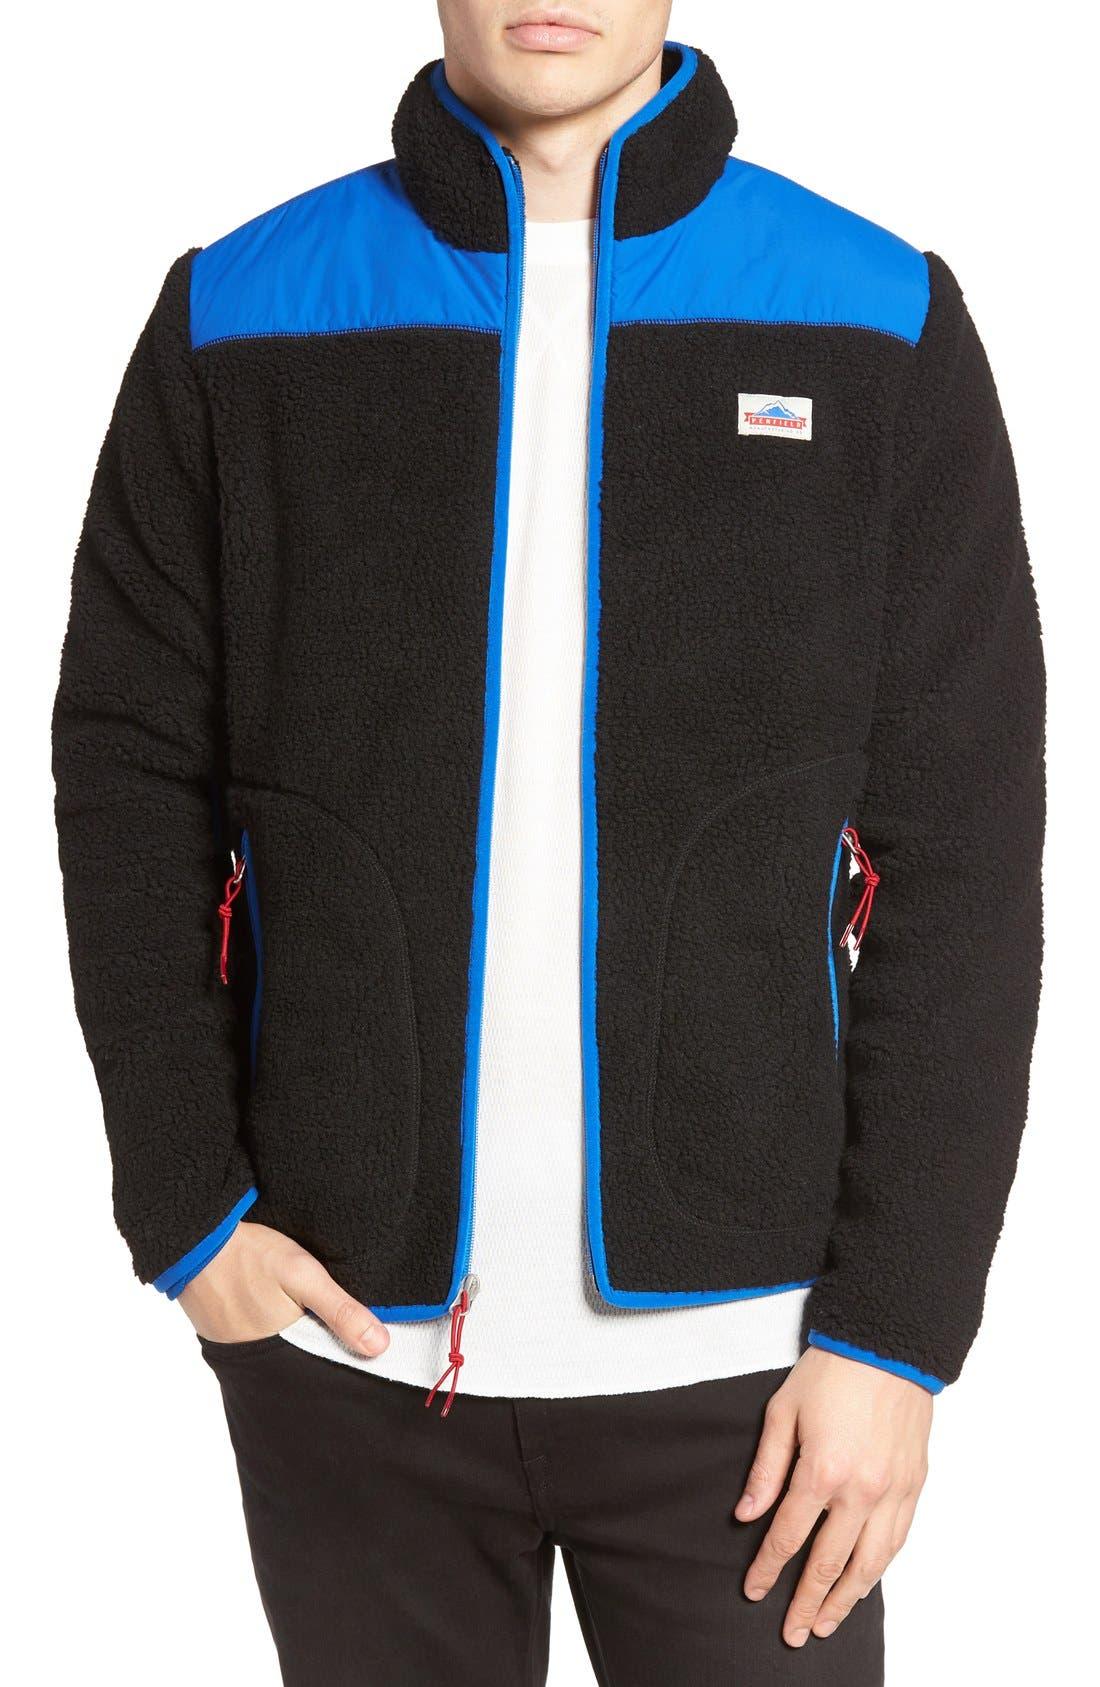 Mattawa Zip Fleece Jacket,                             Main thumbnail 1, color,                             001